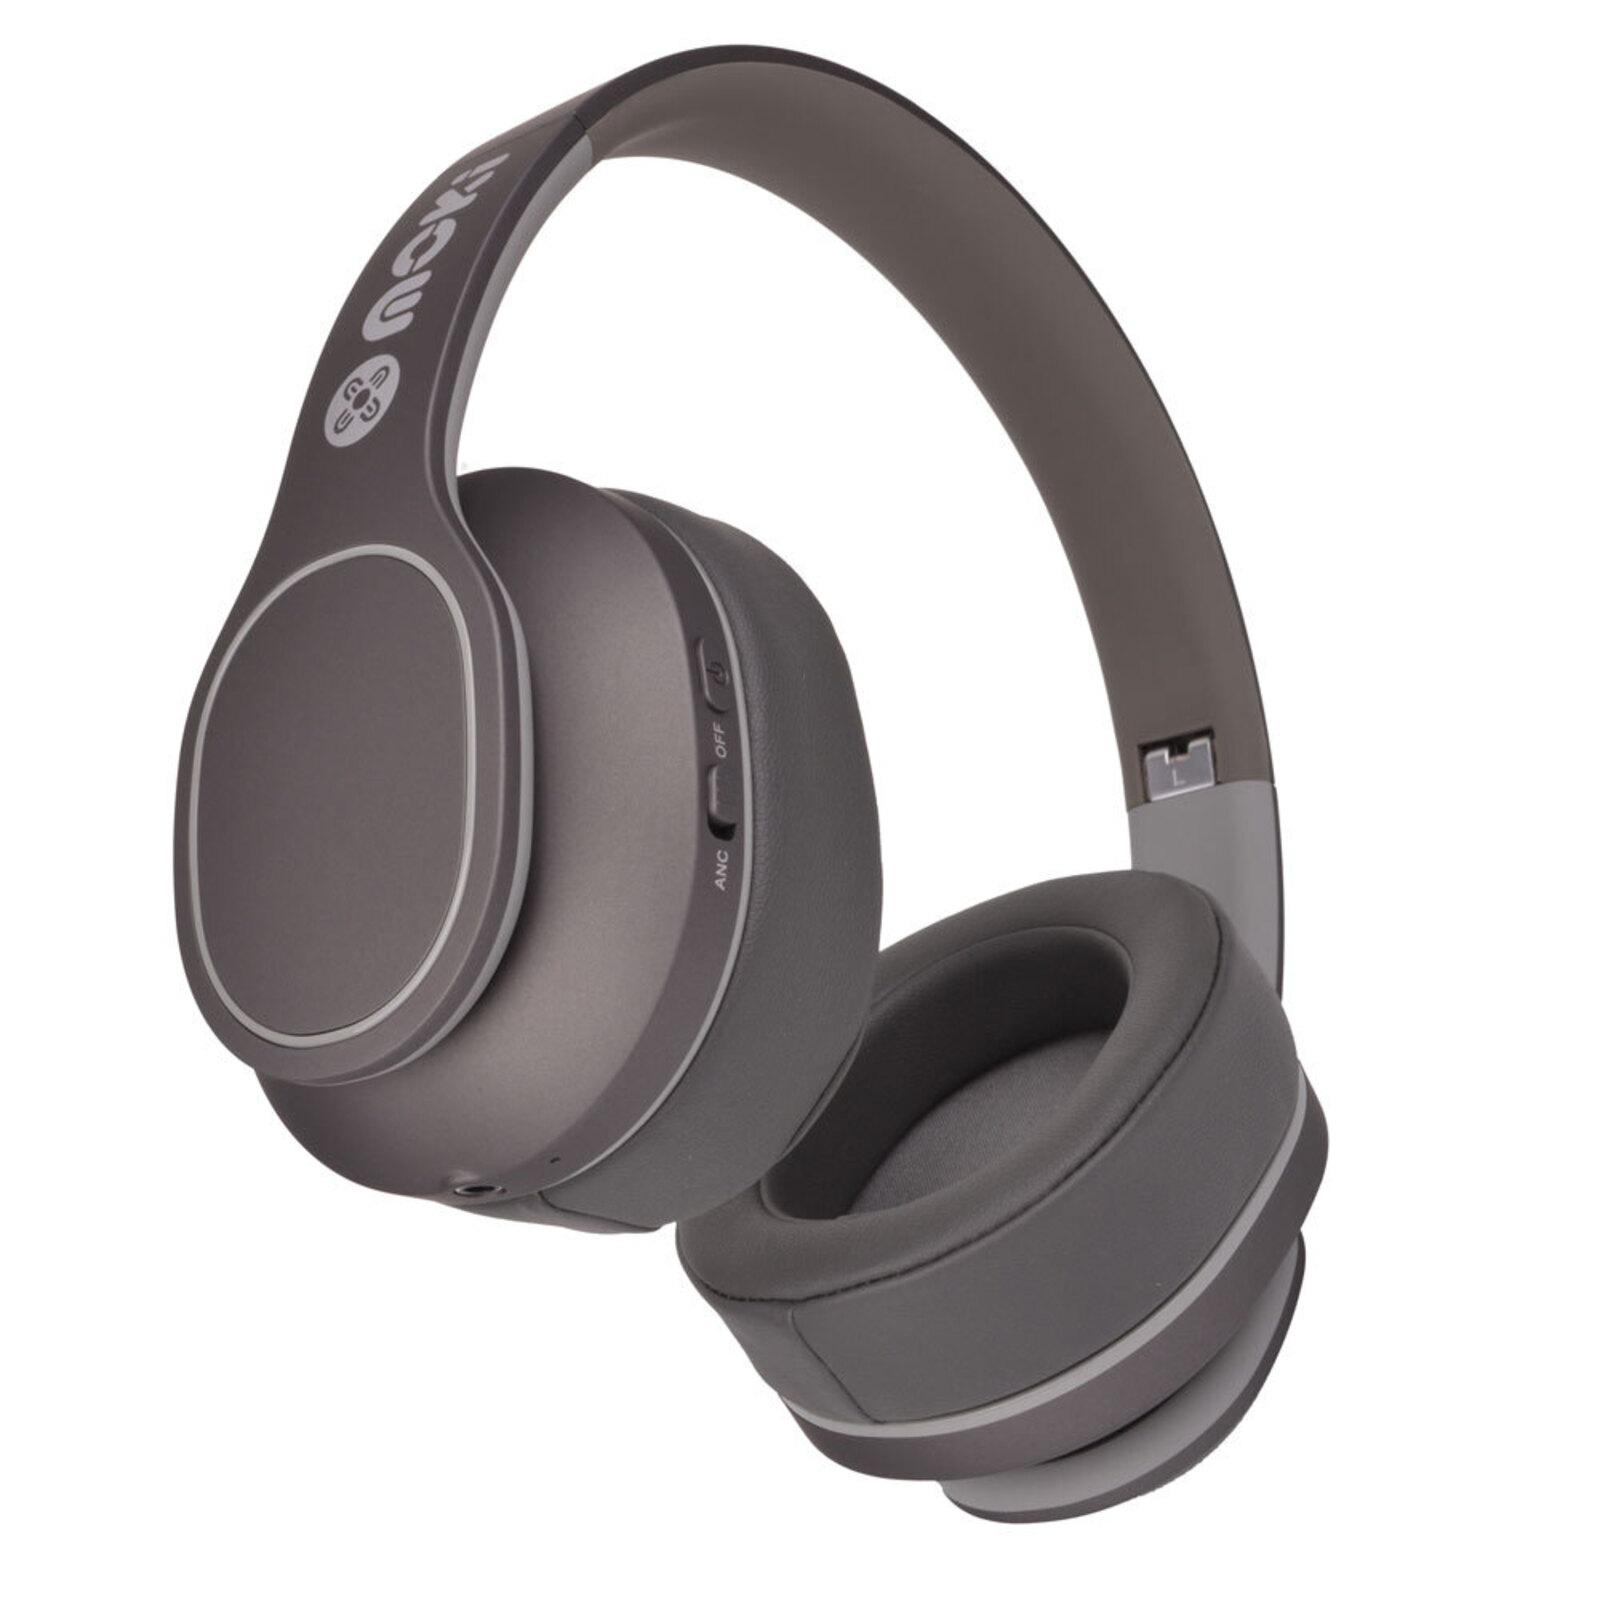 Moki Navigator Noise Cancellation Bluetooth Headphones On Ear Cup Headband Grey